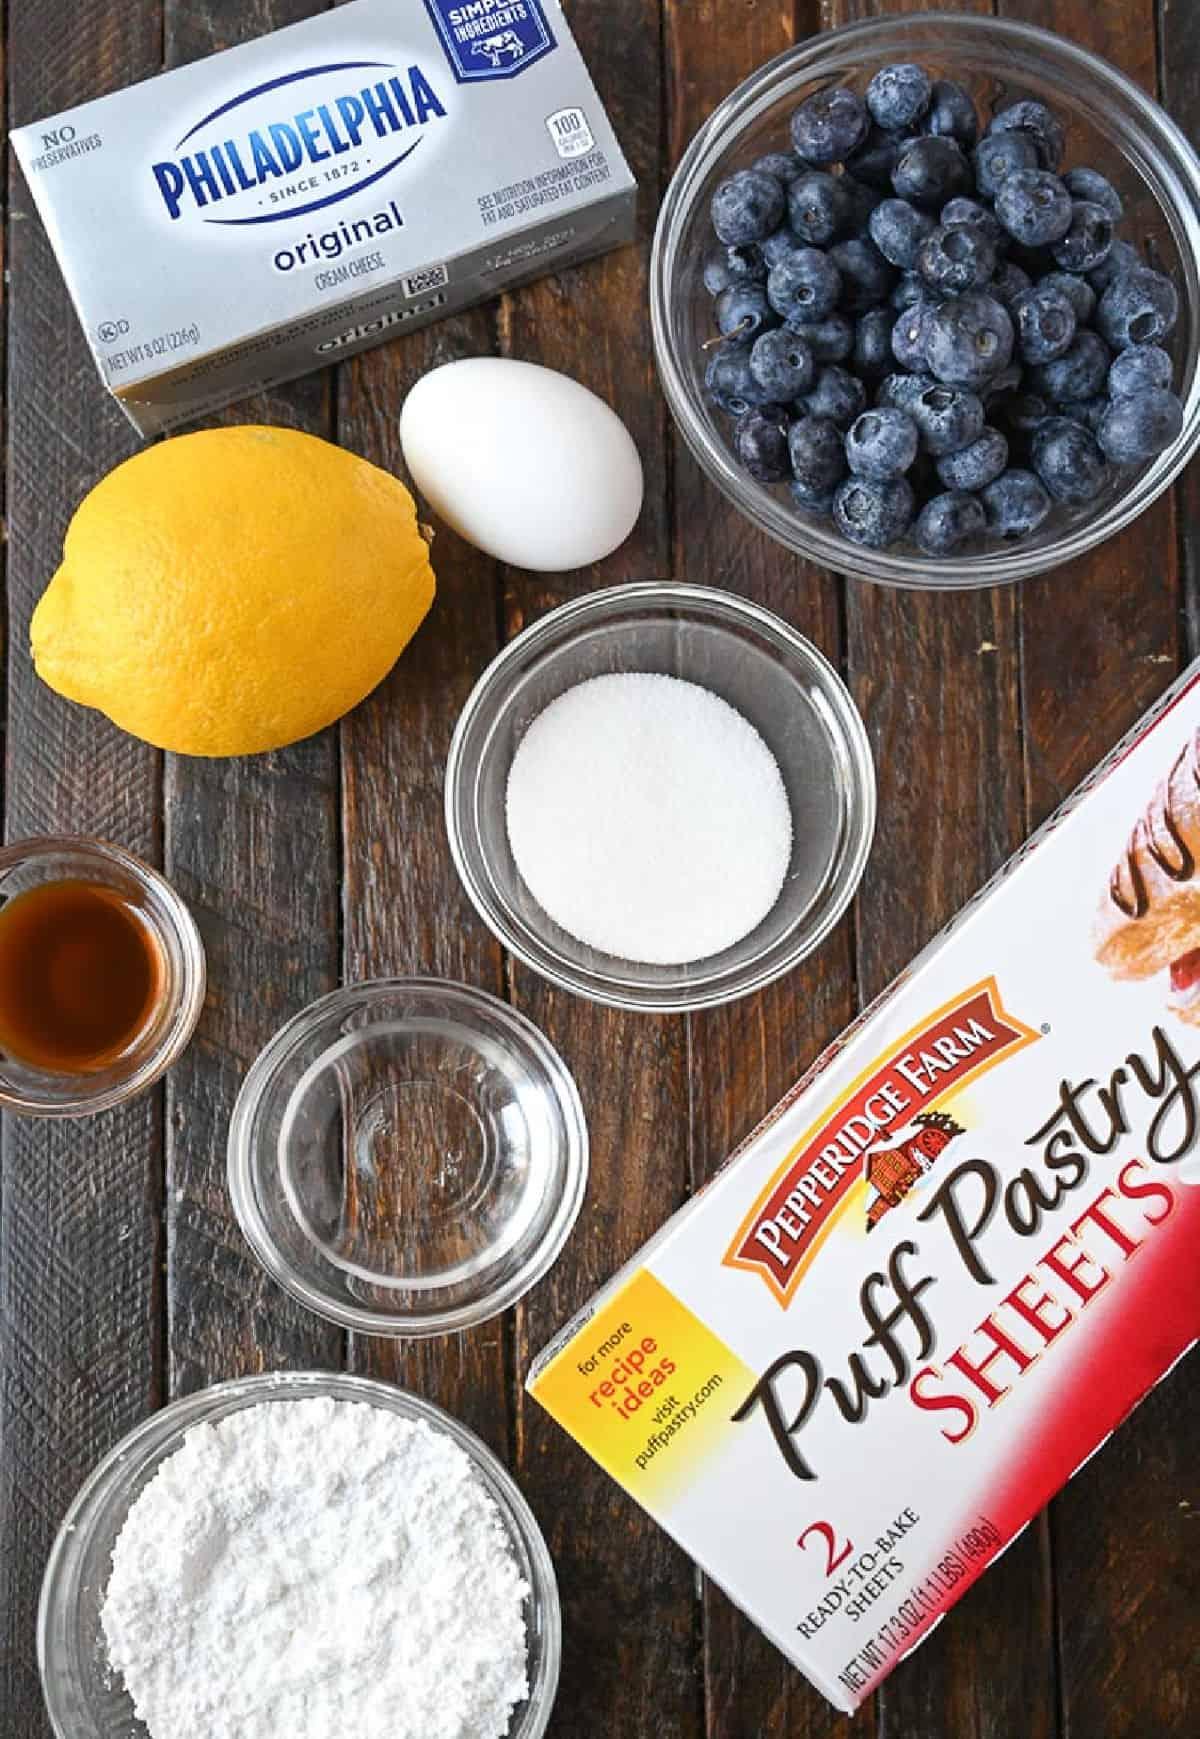 Blueberry cream cheese danish ingredients.